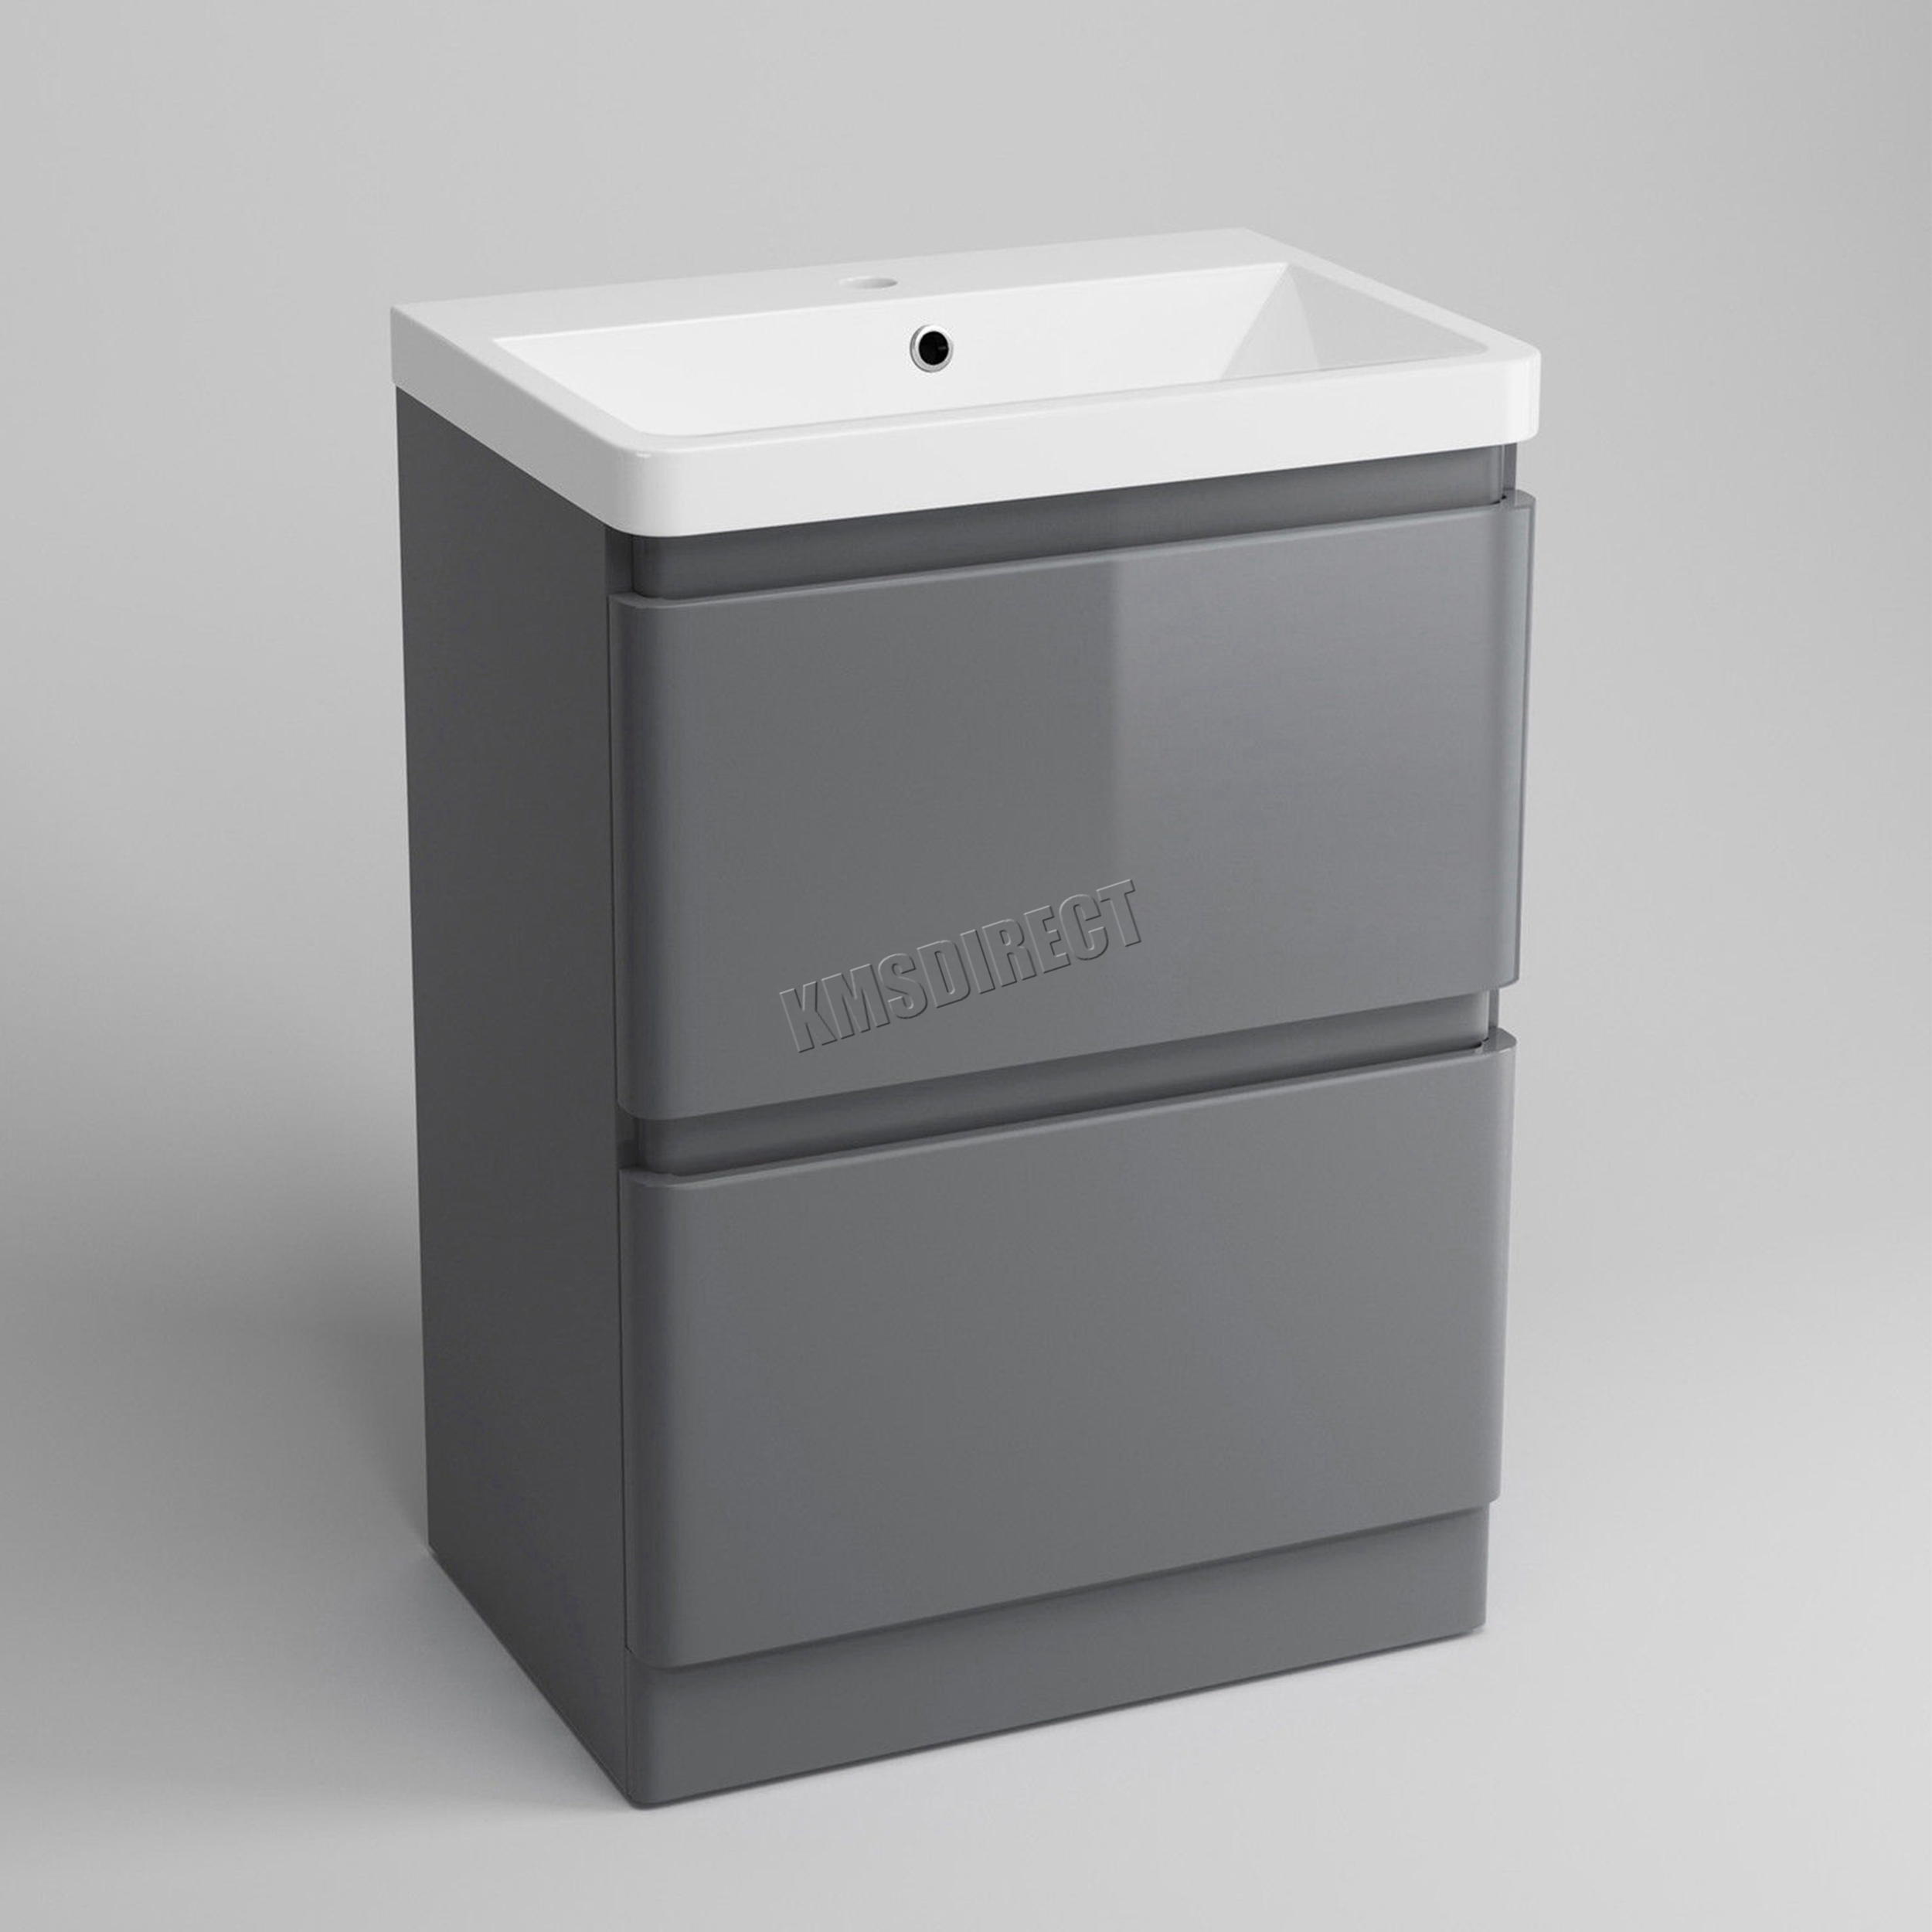 Foxhunter Vanity Unit Mdf High Gloss 2 Drawers Basin Bathroom Cabinet Storage Ebay